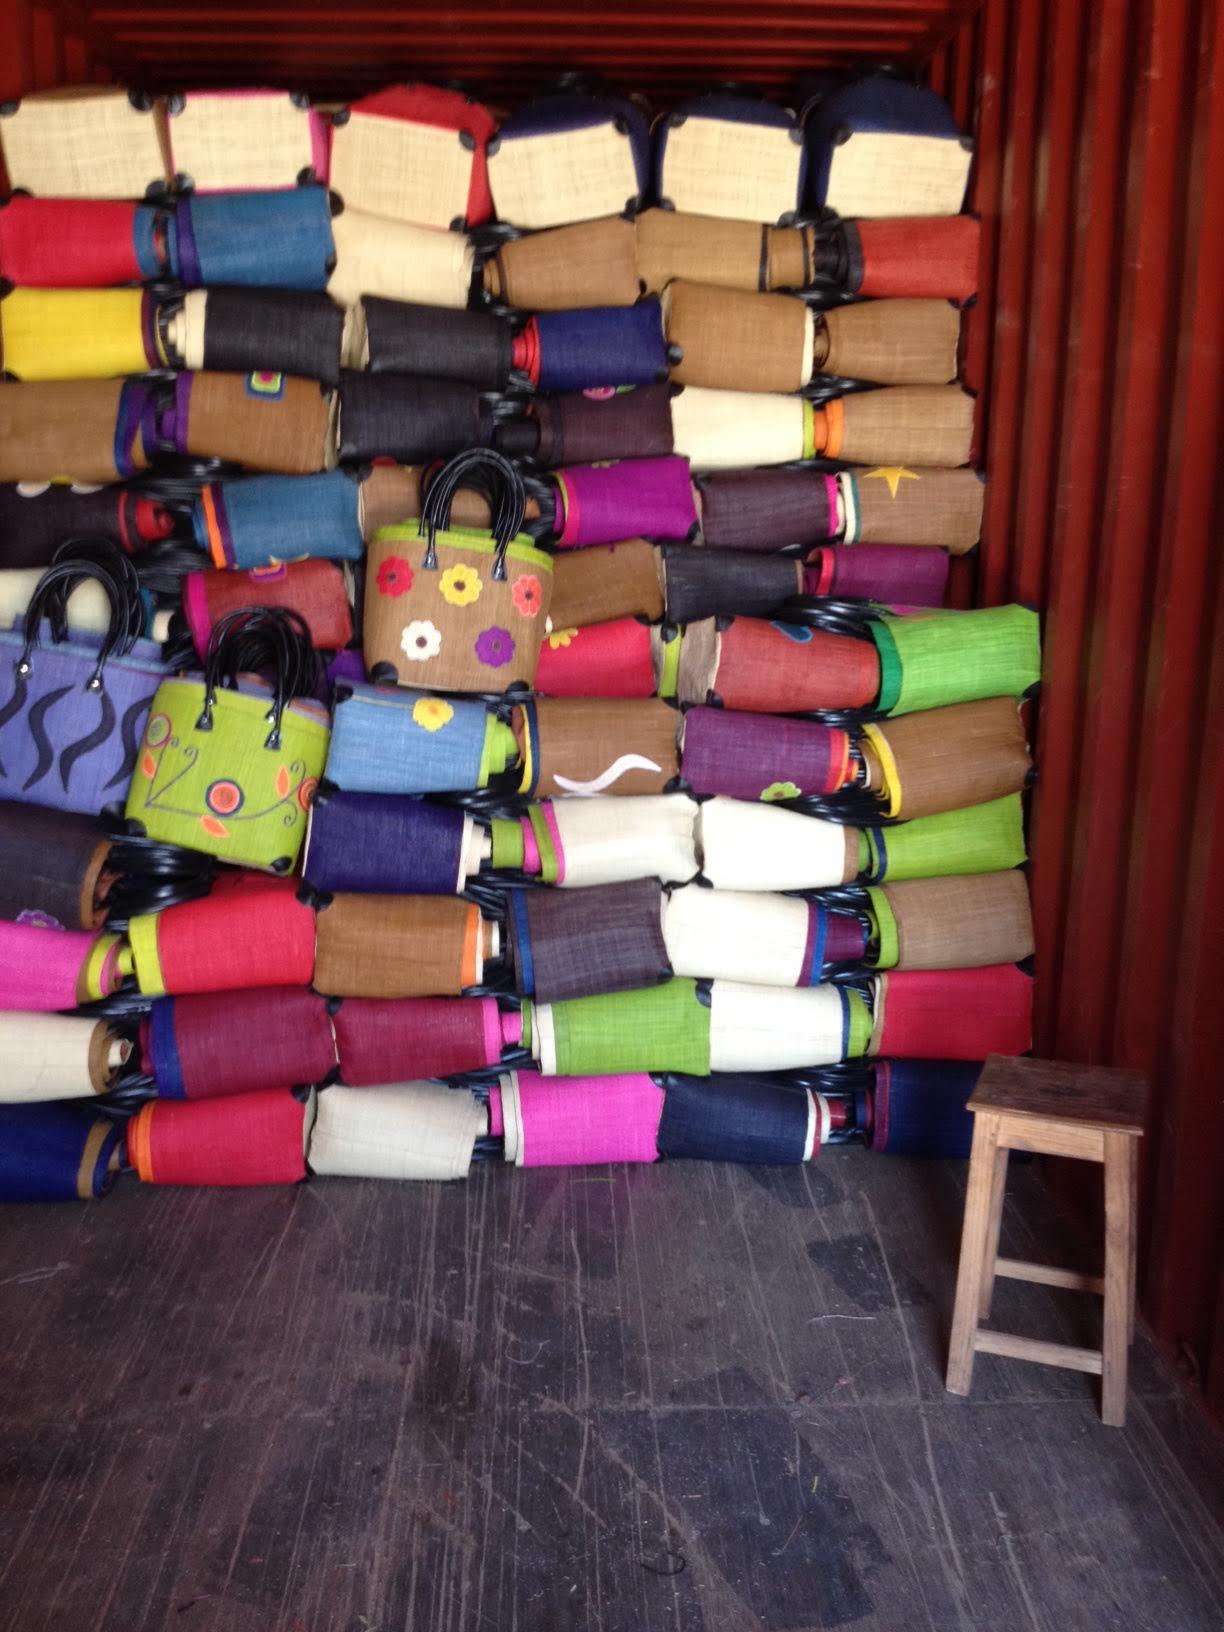 Nos produits - Hautex Artisanat de Madagascar Vente en gros et grossiste